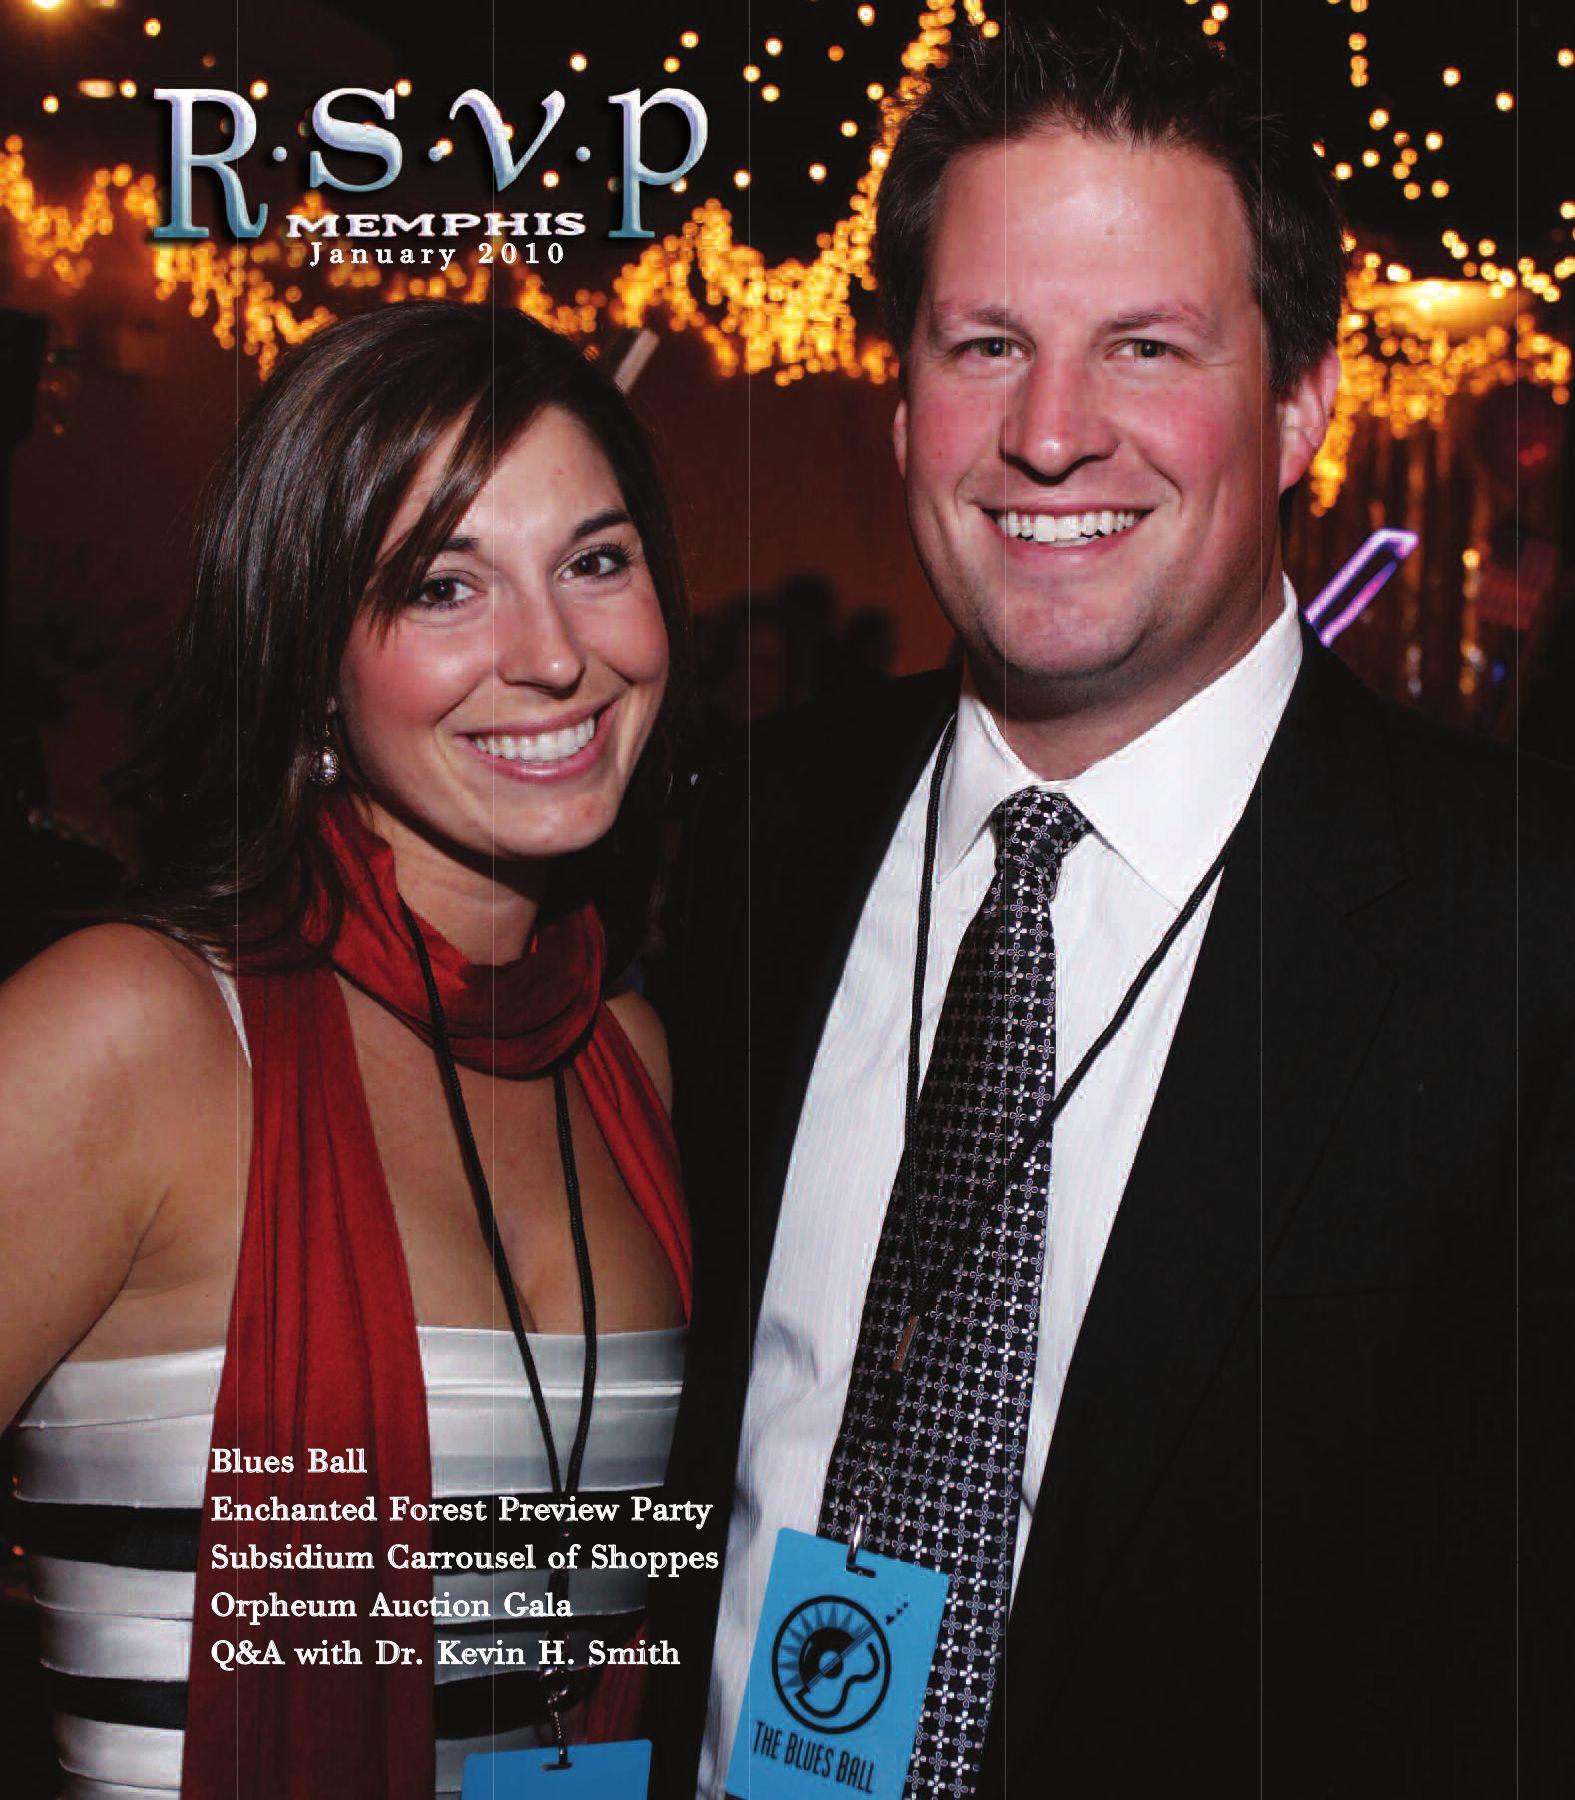 Rsvp Magazine January 2010 By Rsvp Magazine Issuu border=